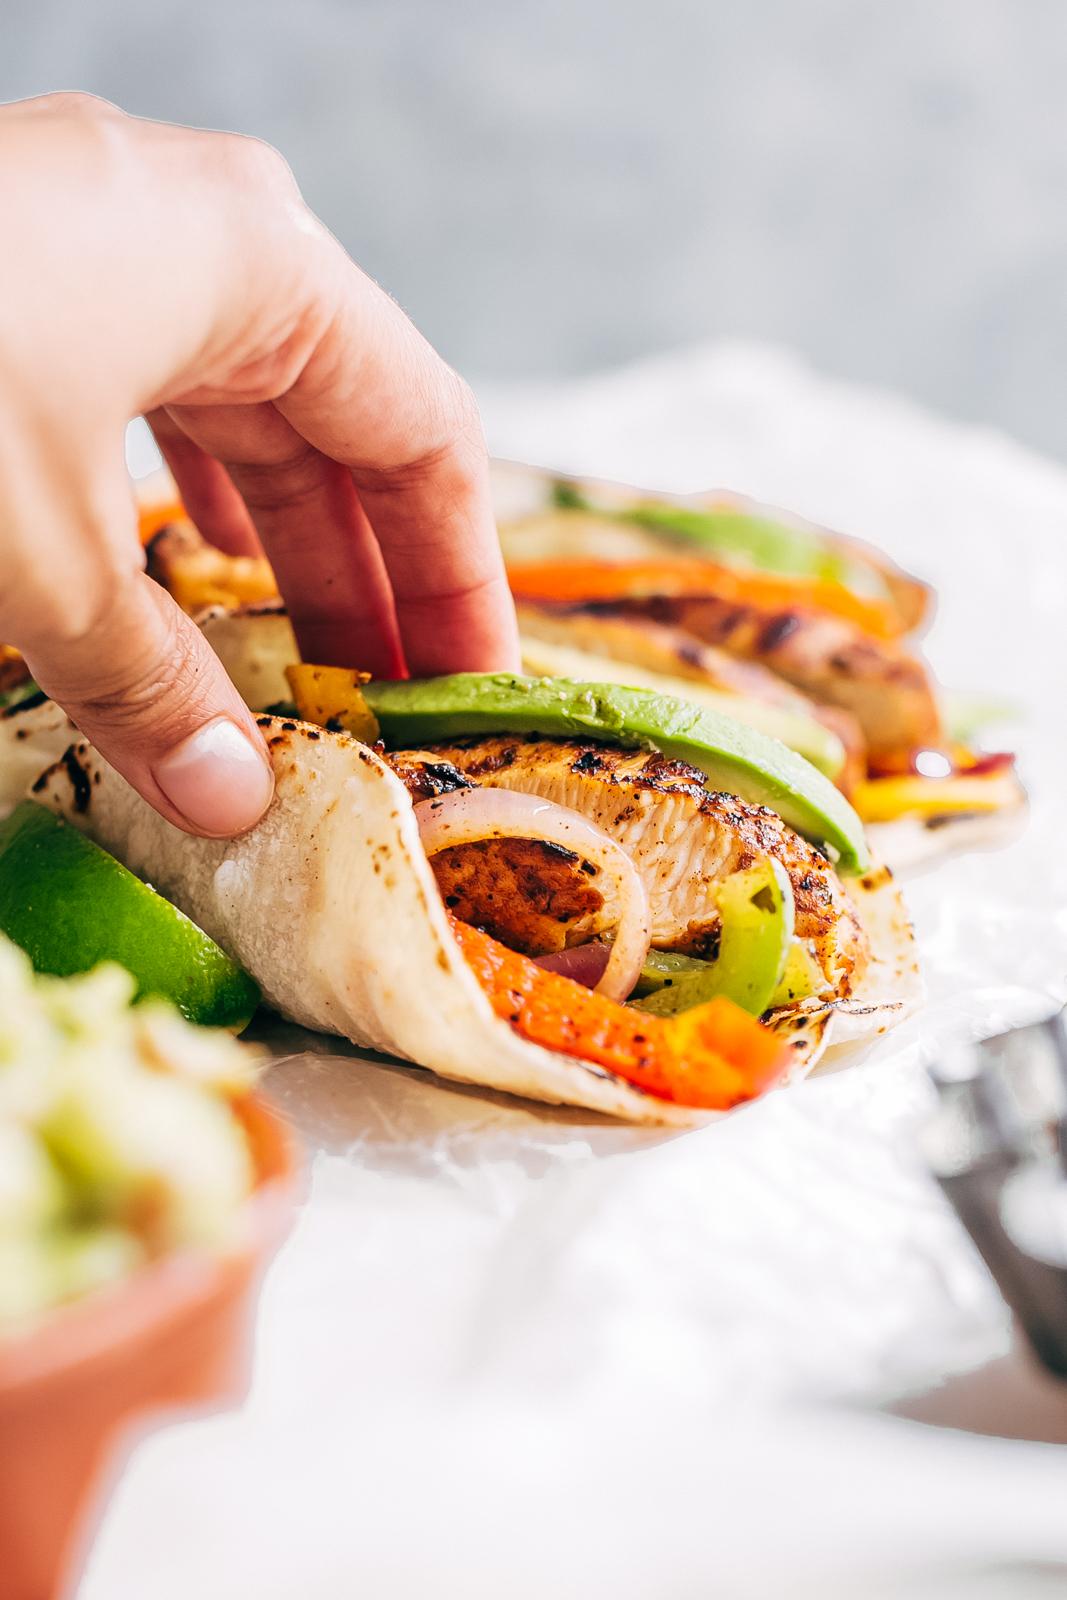 hand holding tortilla with chicken fajitas, sliced avocados and sautéed veggies